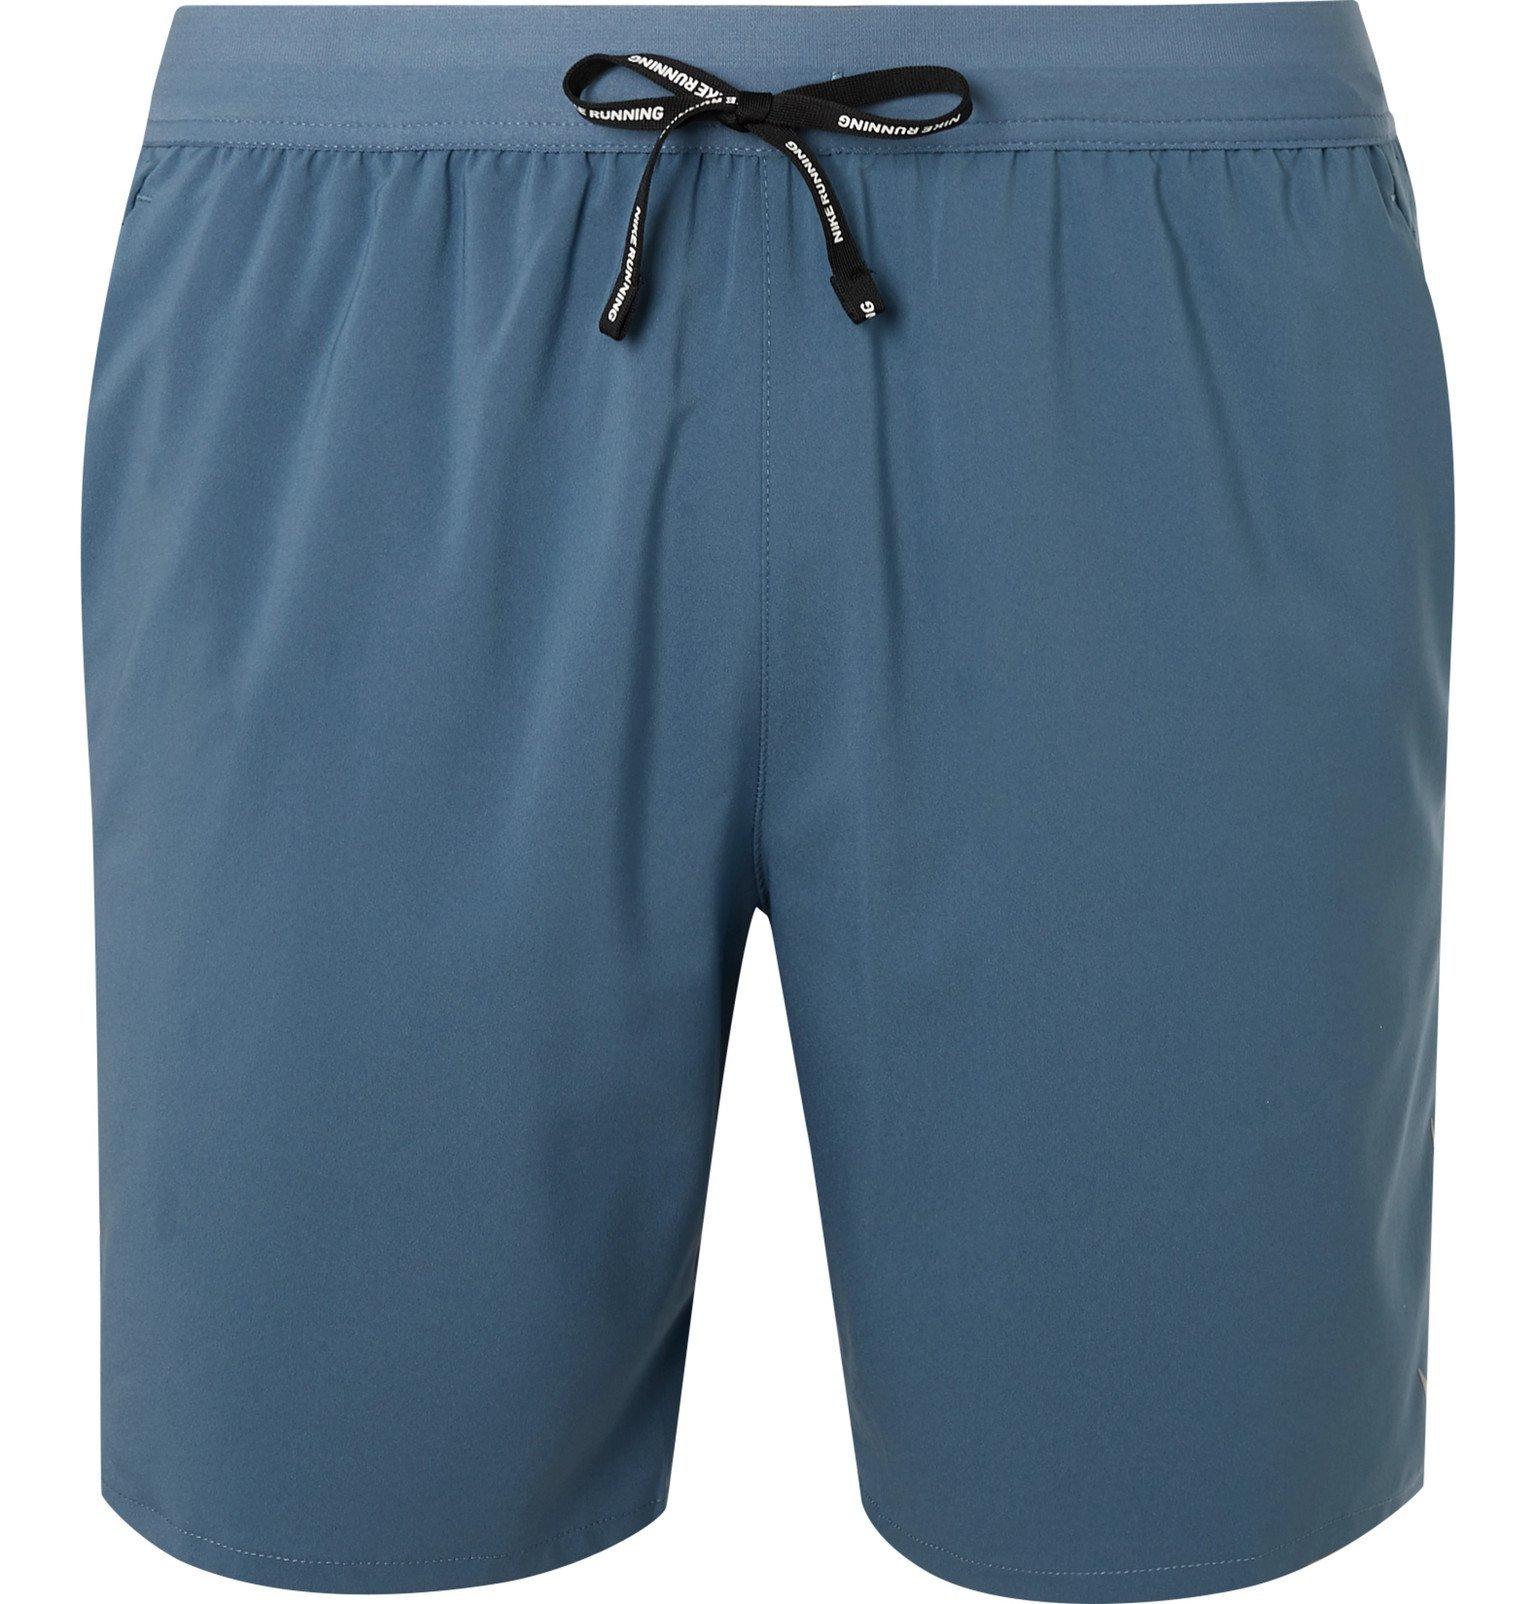 Nike Running - Stride 2-in-1 Flex Dri-FIT Shorts - Blue